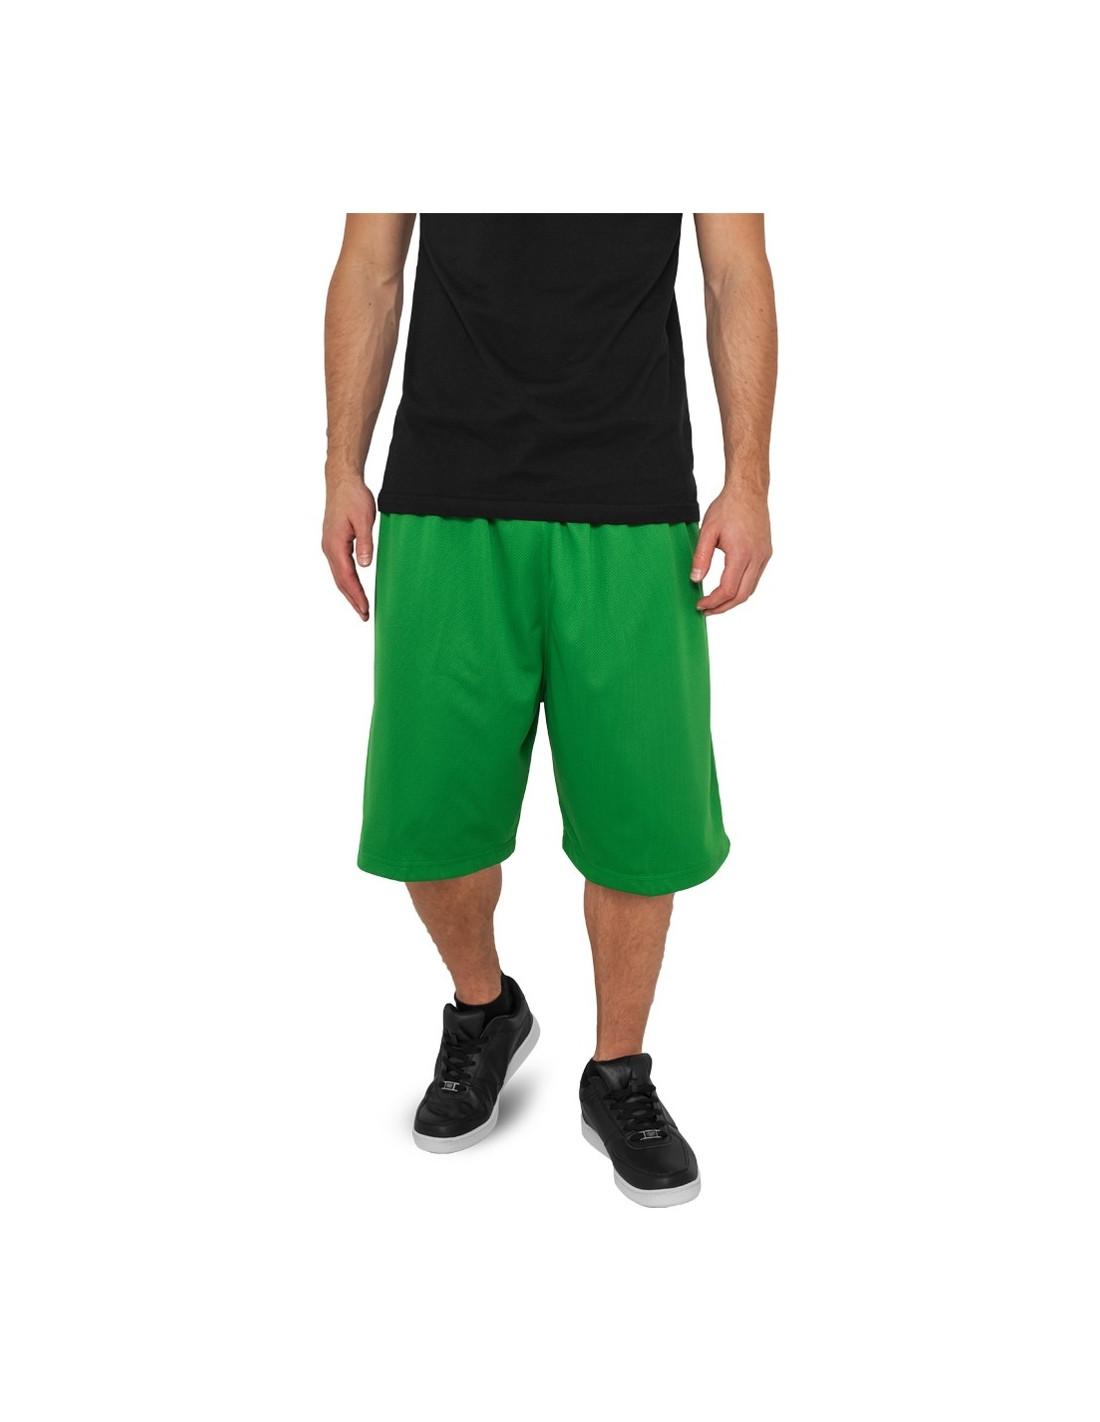 Urban Bball Mesh Shorts c.green